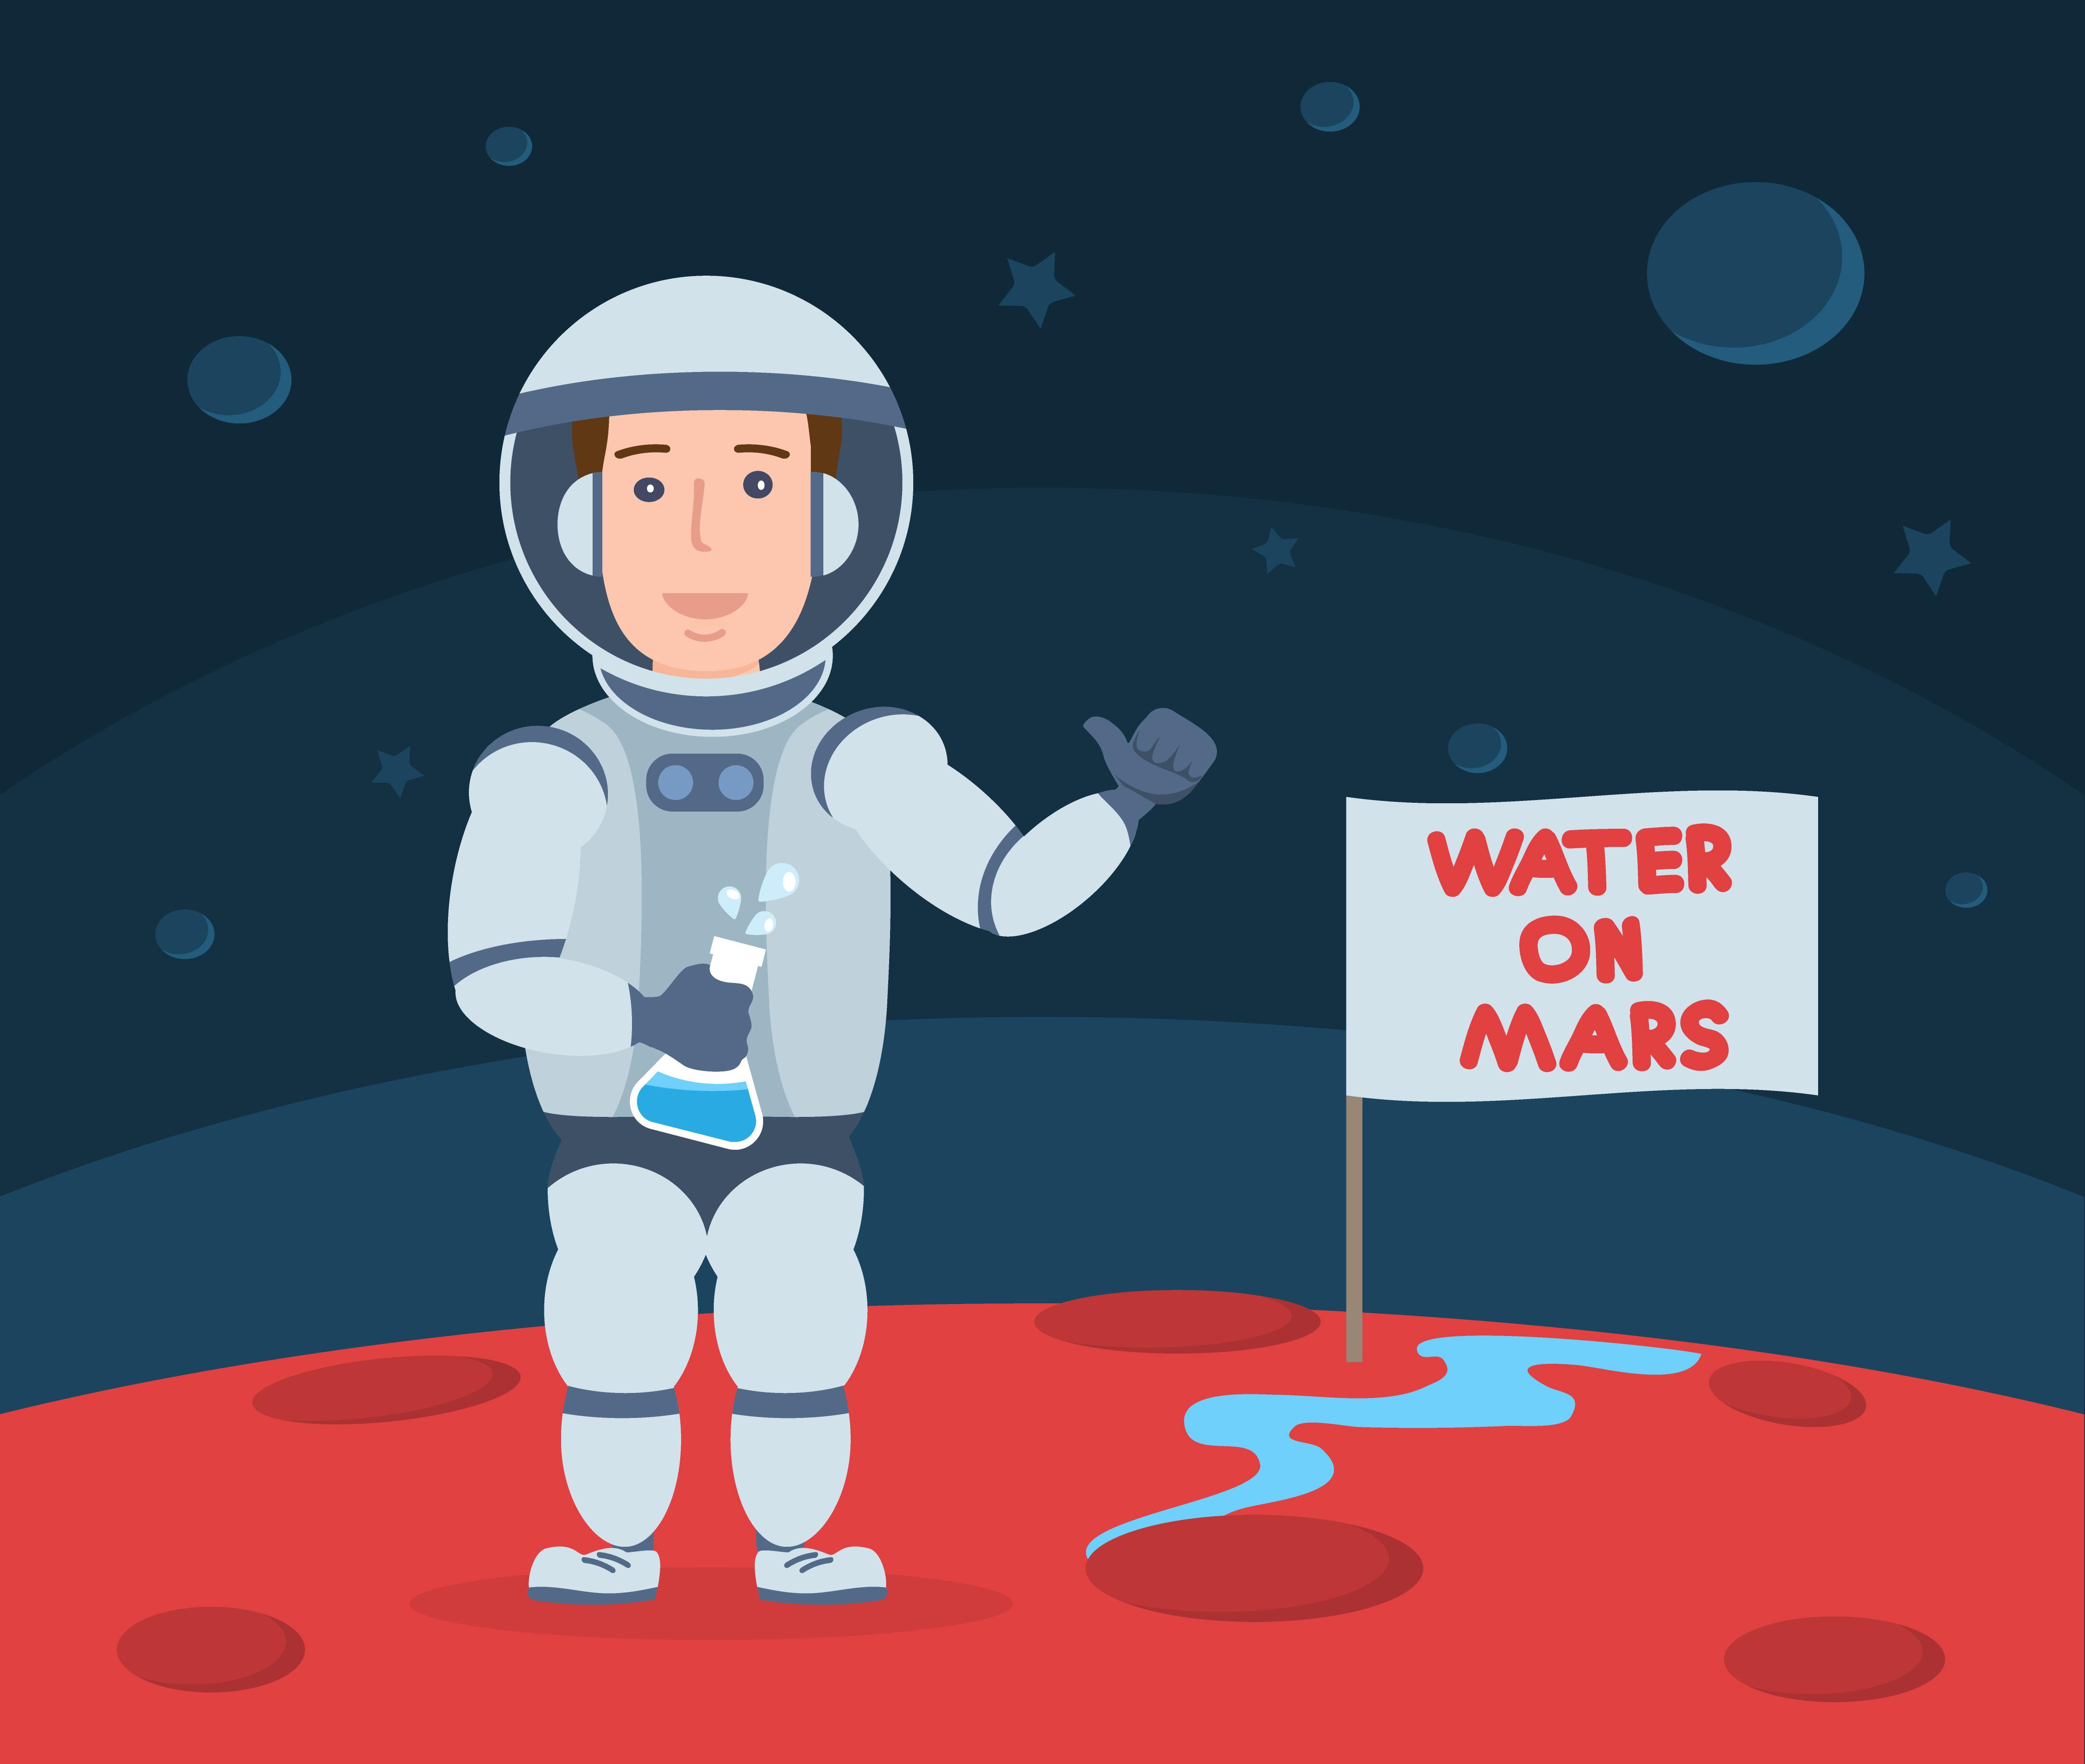 4.Mars-Matter: